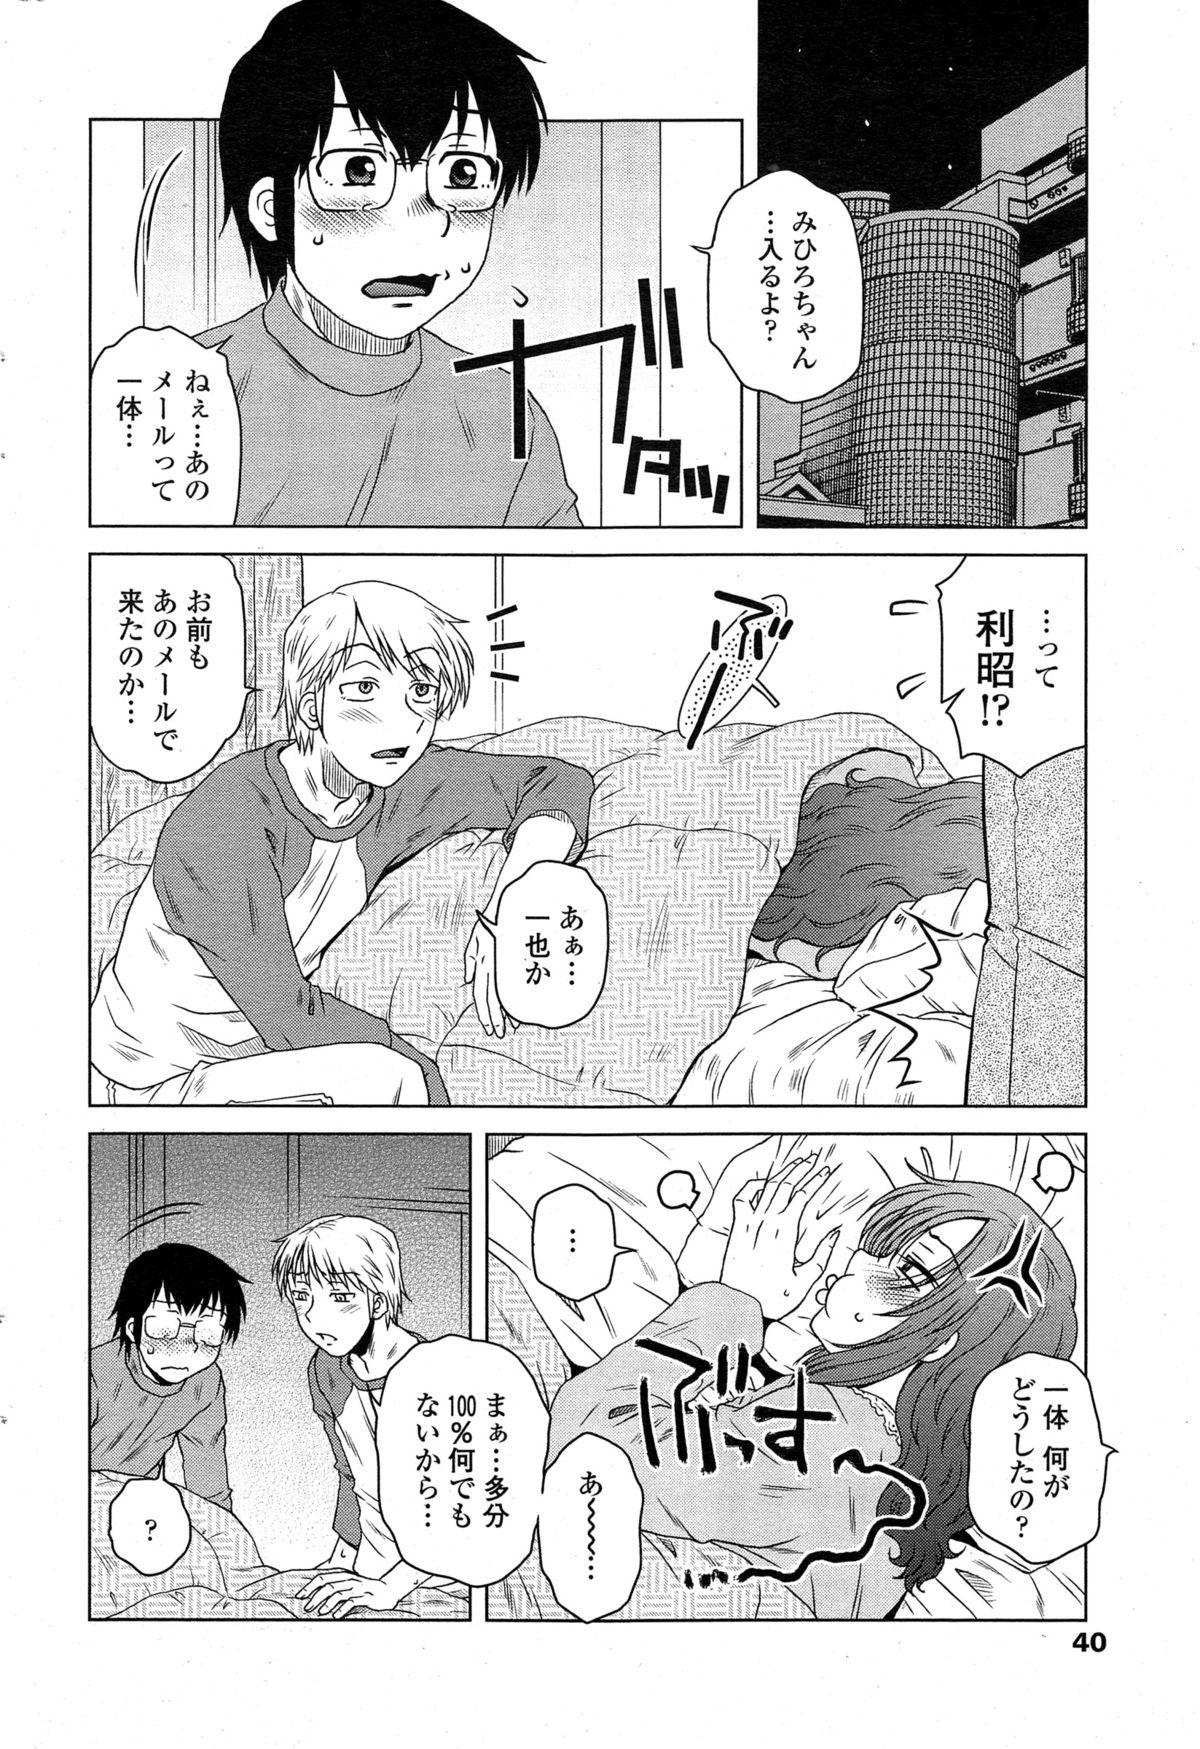 [Kurumiya Mashimin] Mikkai-chuu ni Tsuki Ch.1-6 83